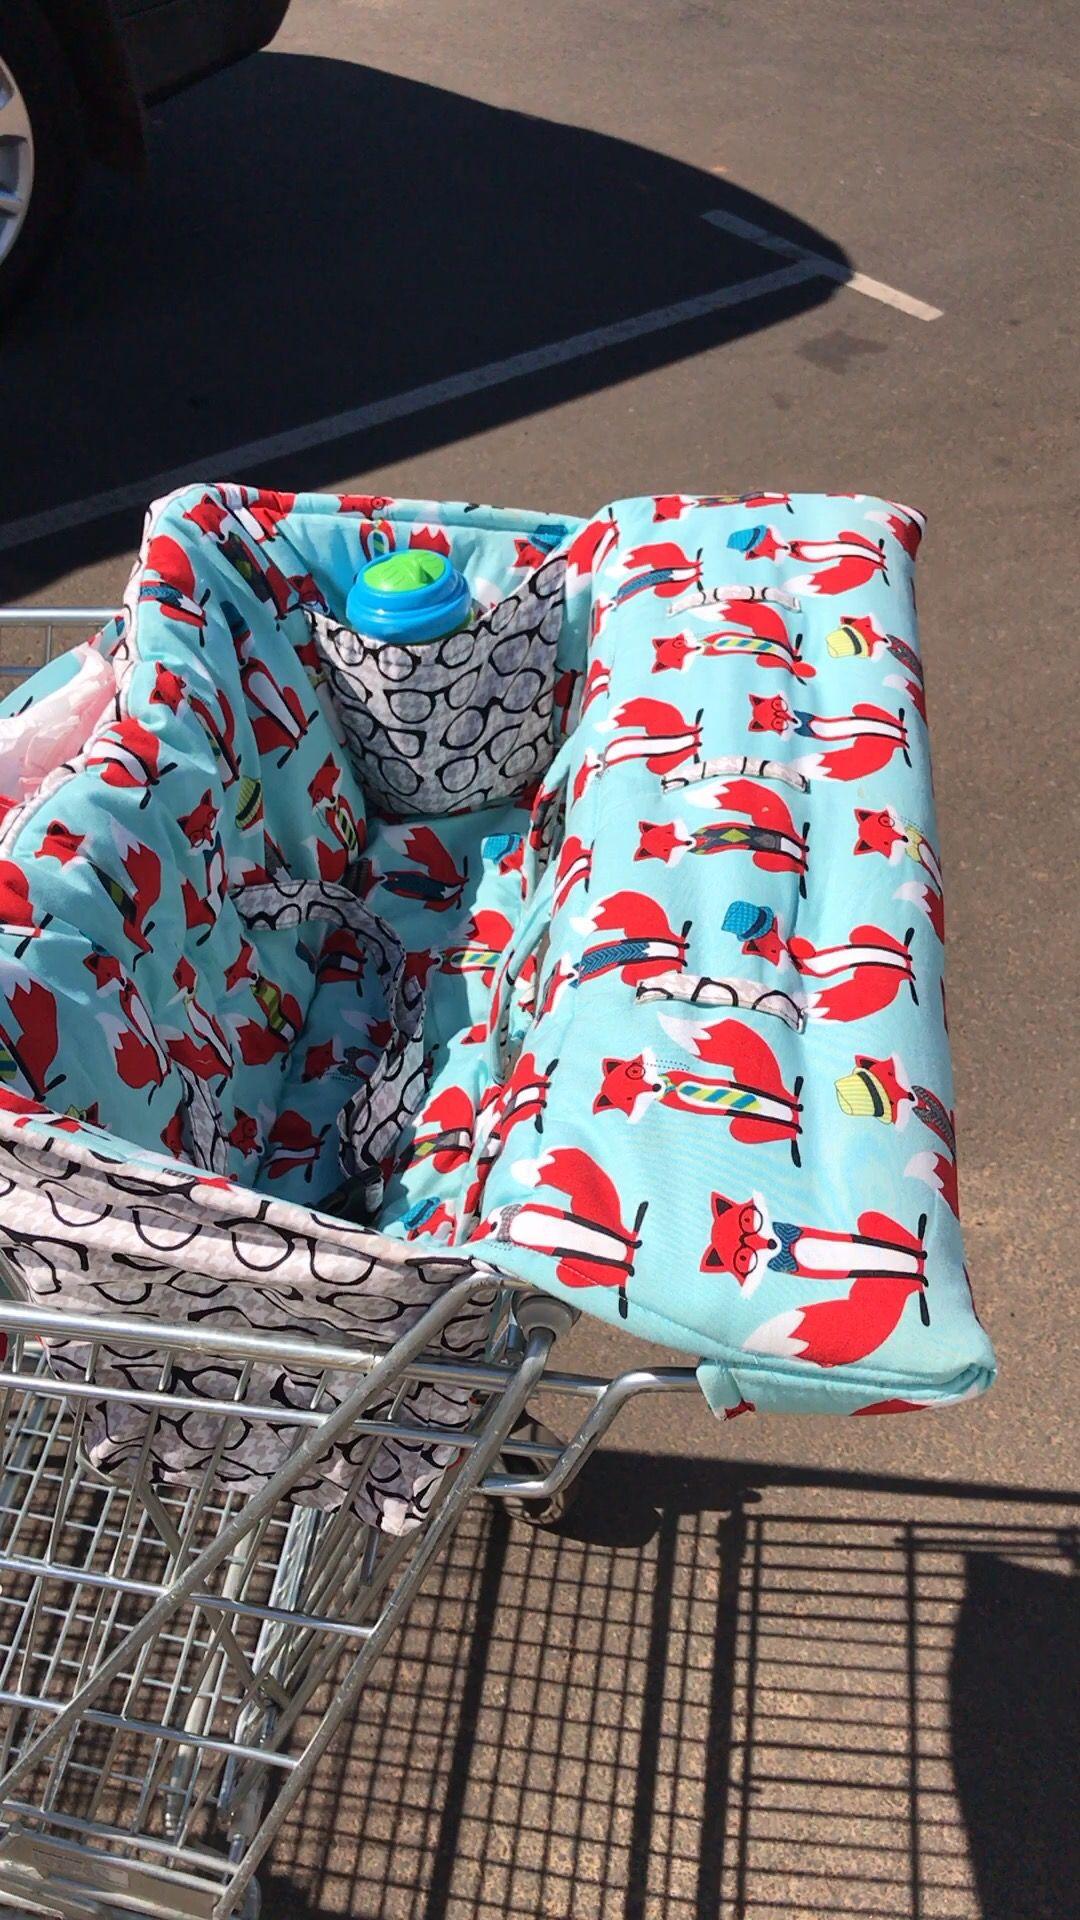 Waterproof change mat Universal Capsule Liner Universal Trolley Liner Handmade Shopping Trolley Liner Shopping Trolley Capsule Liner